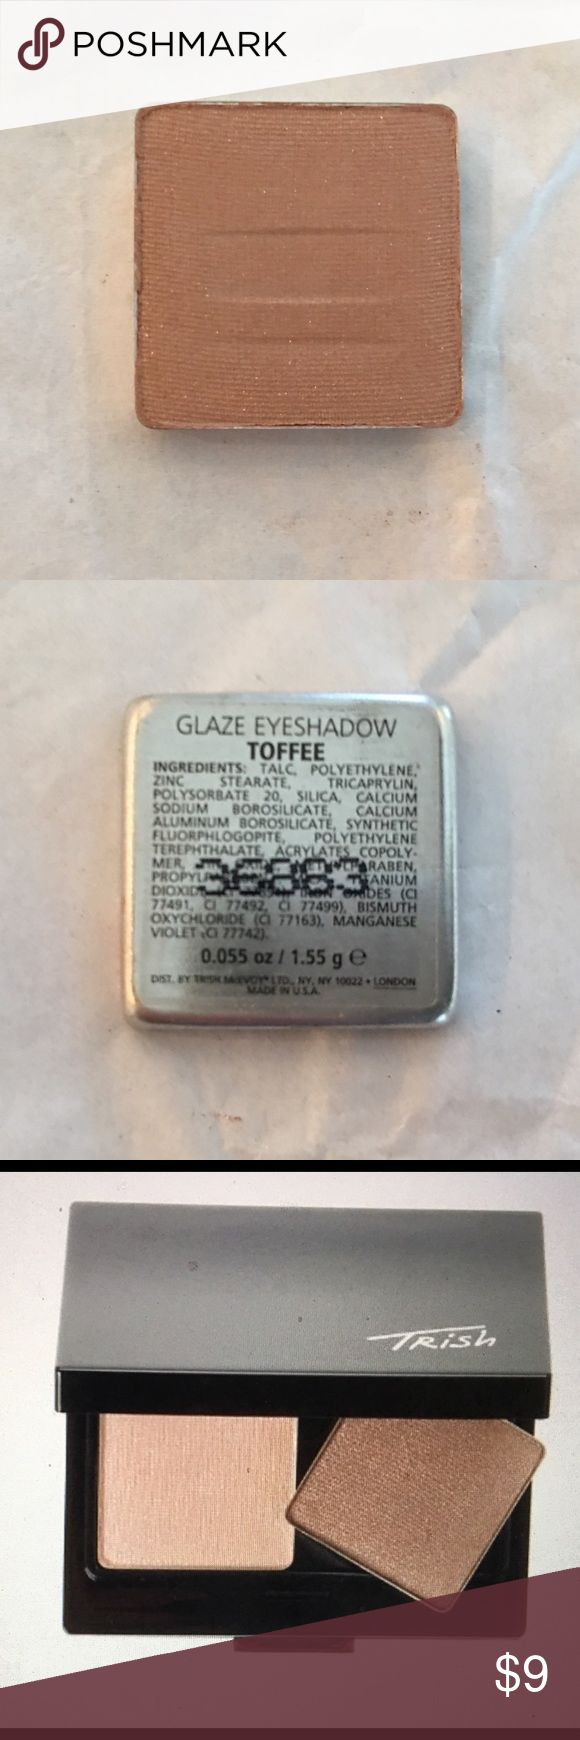 Trish McEvoy Toffee Glaze Eye Shadows Brand New. Never has been used is Trish McEvoy Toffee Glaze Eye Shadow. TM Glaze Eye Shadows give eyes a delicate Shimmer. Fits in TM Make Up wardrobing system. Trish McEvoy Makeup Eyeshadow